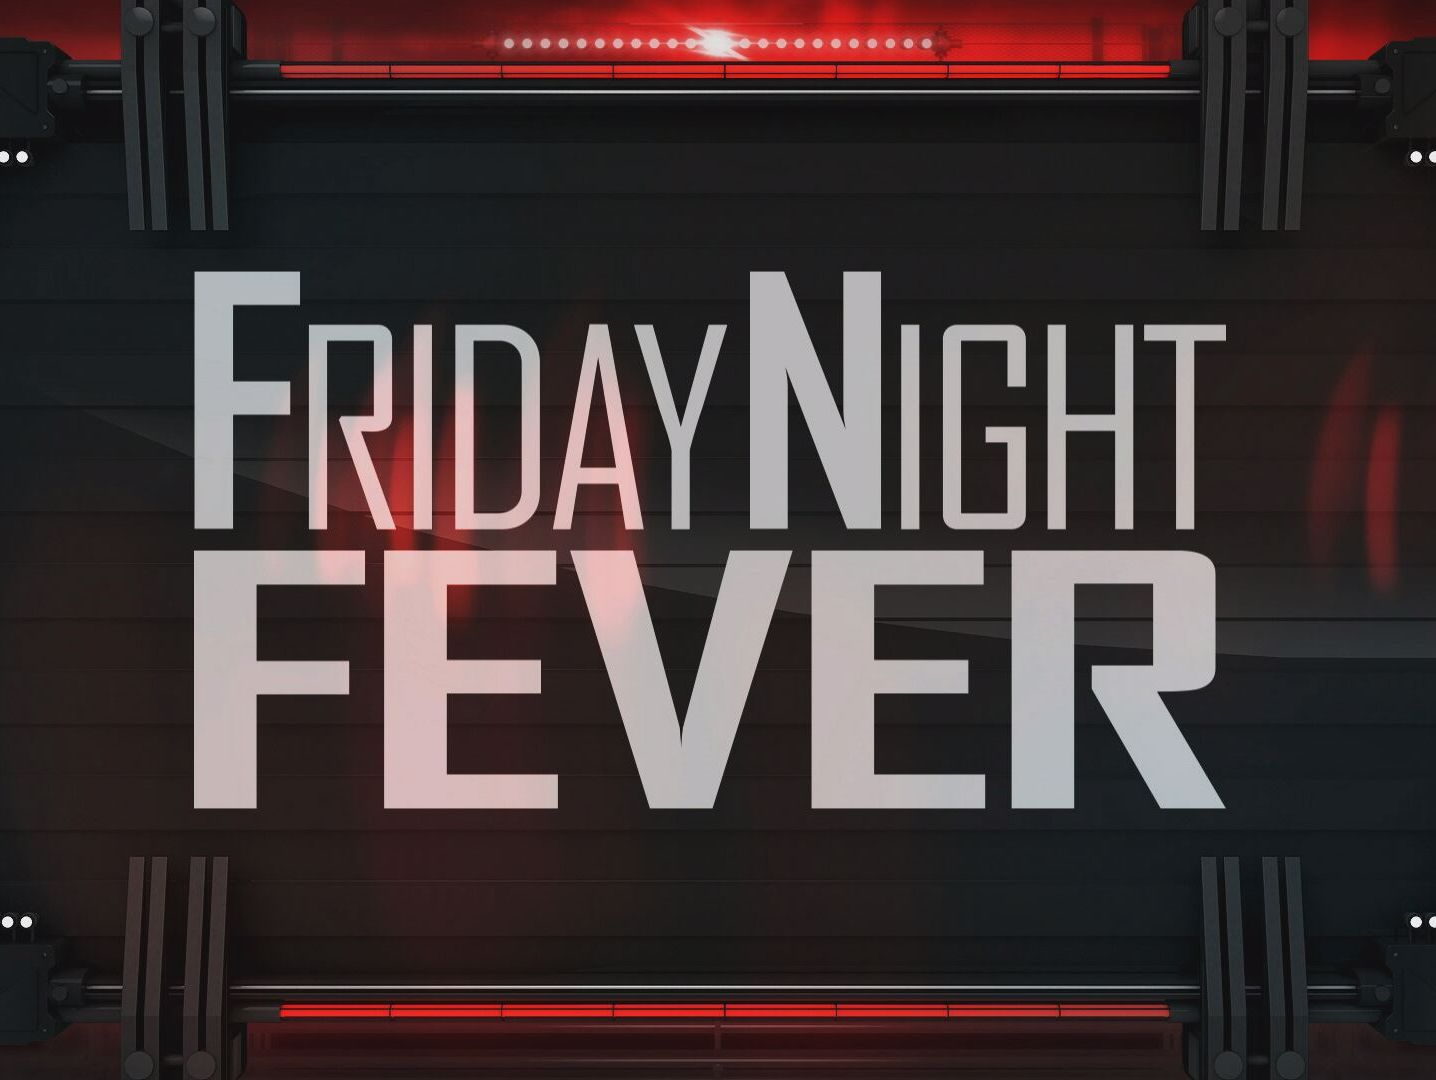 2015 Friday Night Fever logo